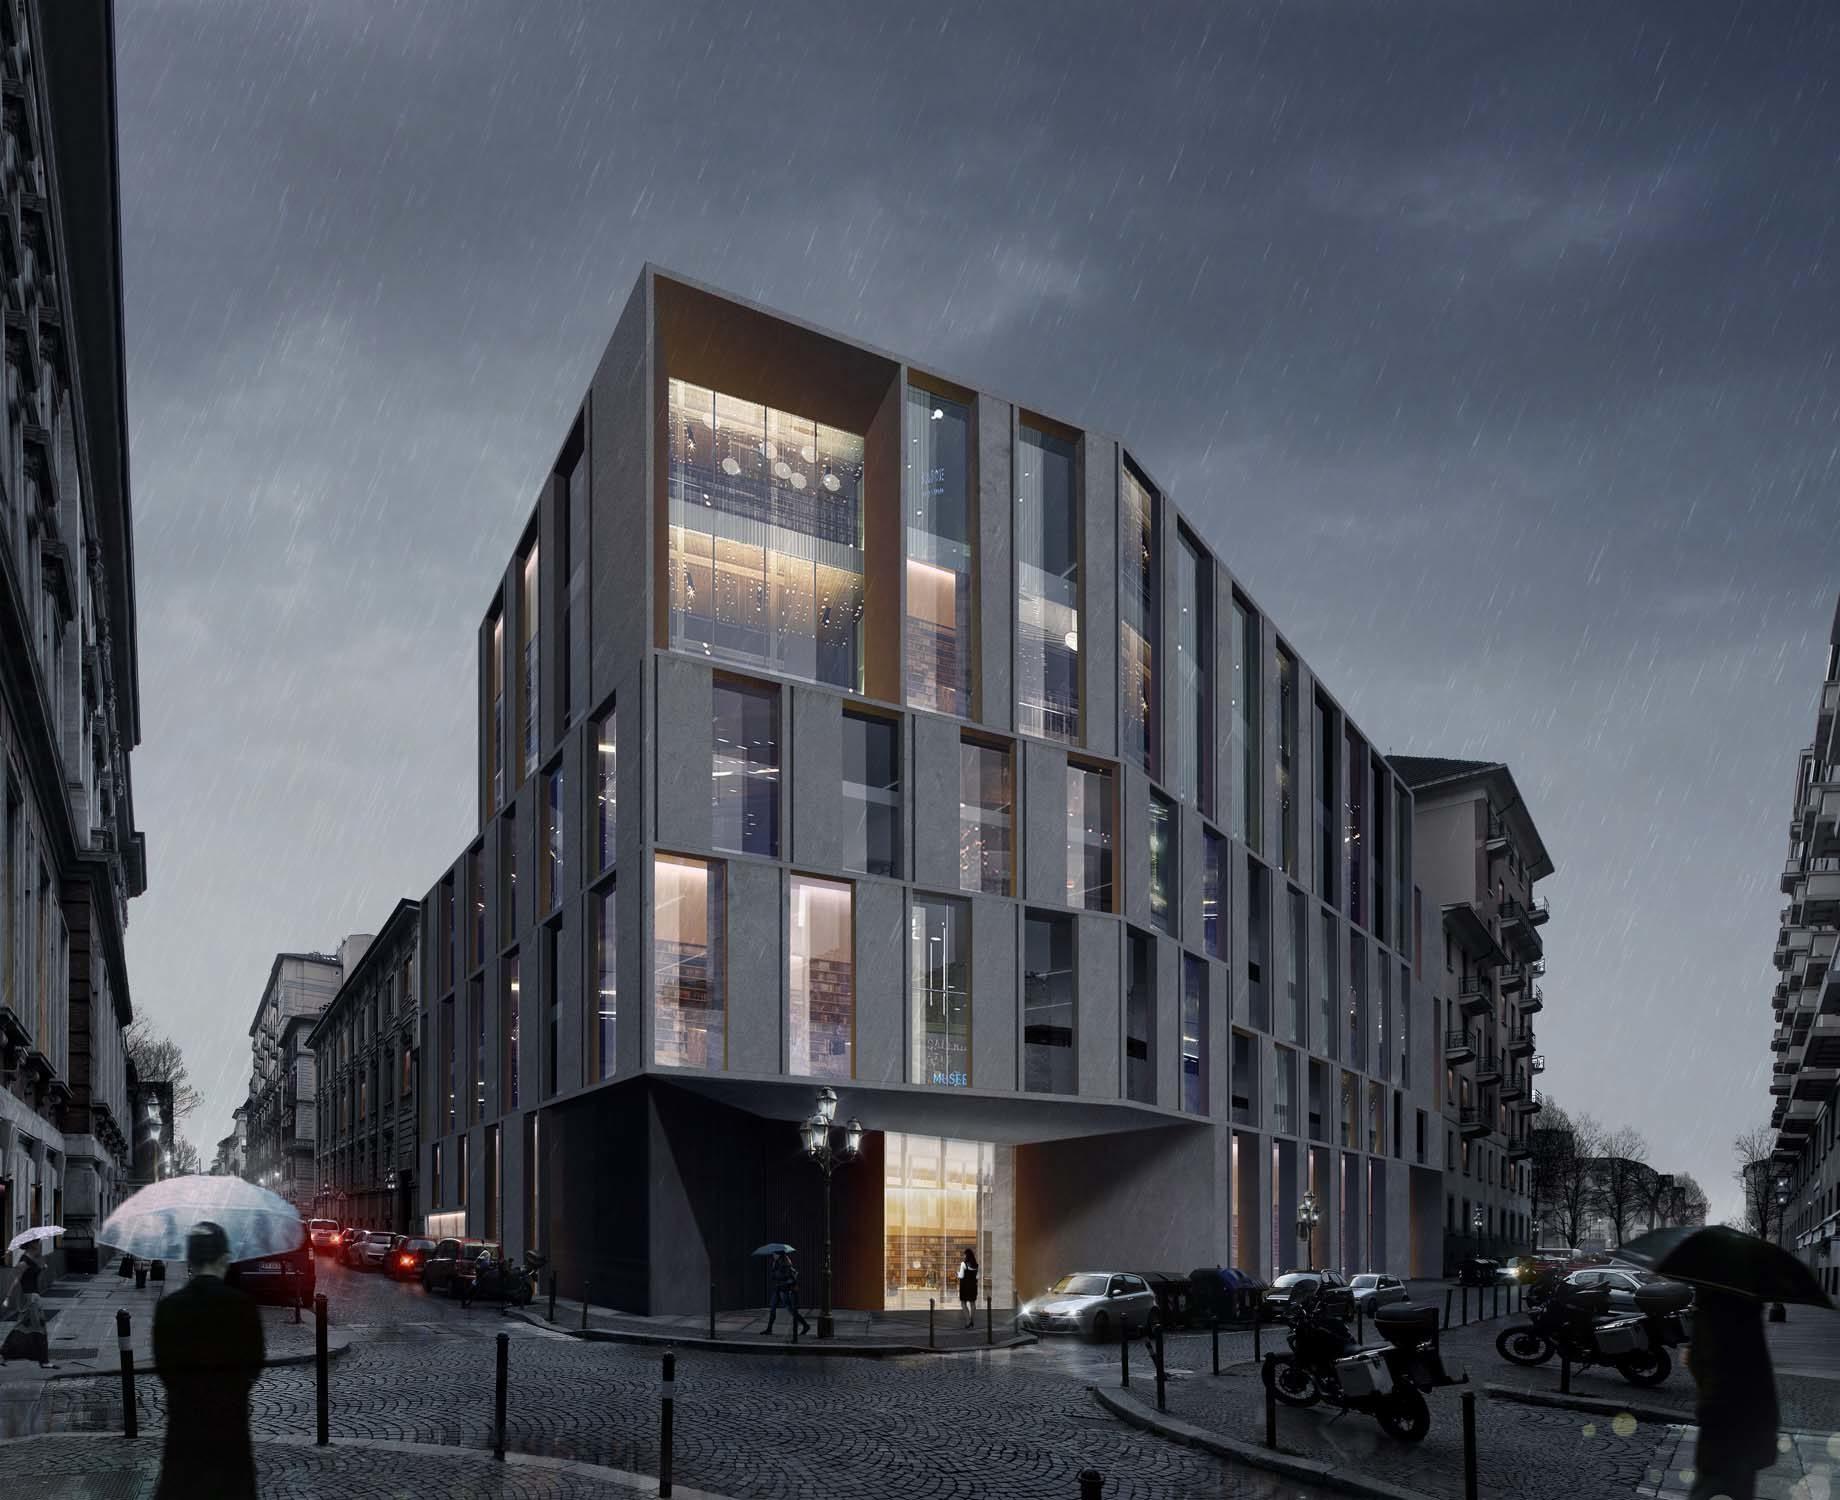 Reale Mutua offices in Turin – Iotti+Pavarani Architetti, 2013